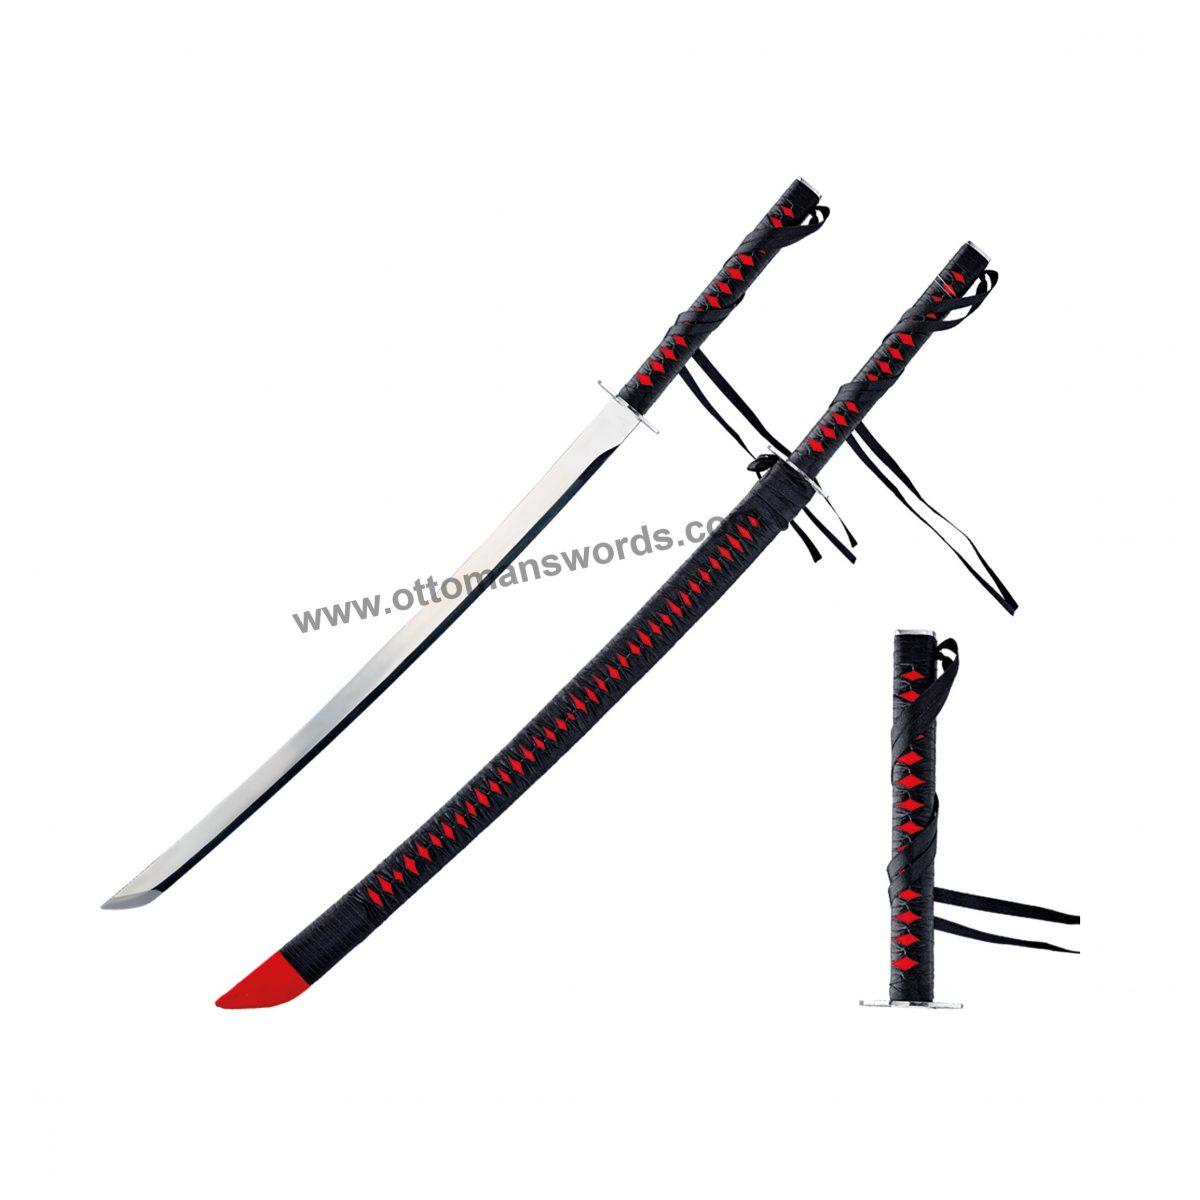 Black samurai sword